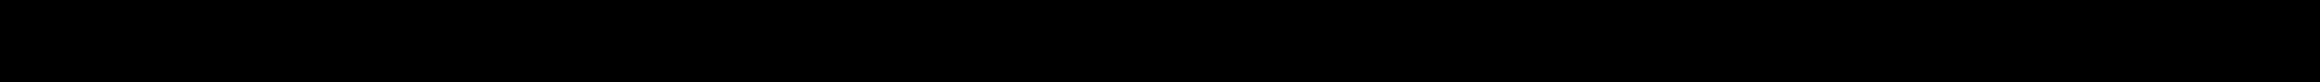 PURFLUX 8456203580, 9456183480, 9456203480, 9456203580, 1890364 Ölfilter